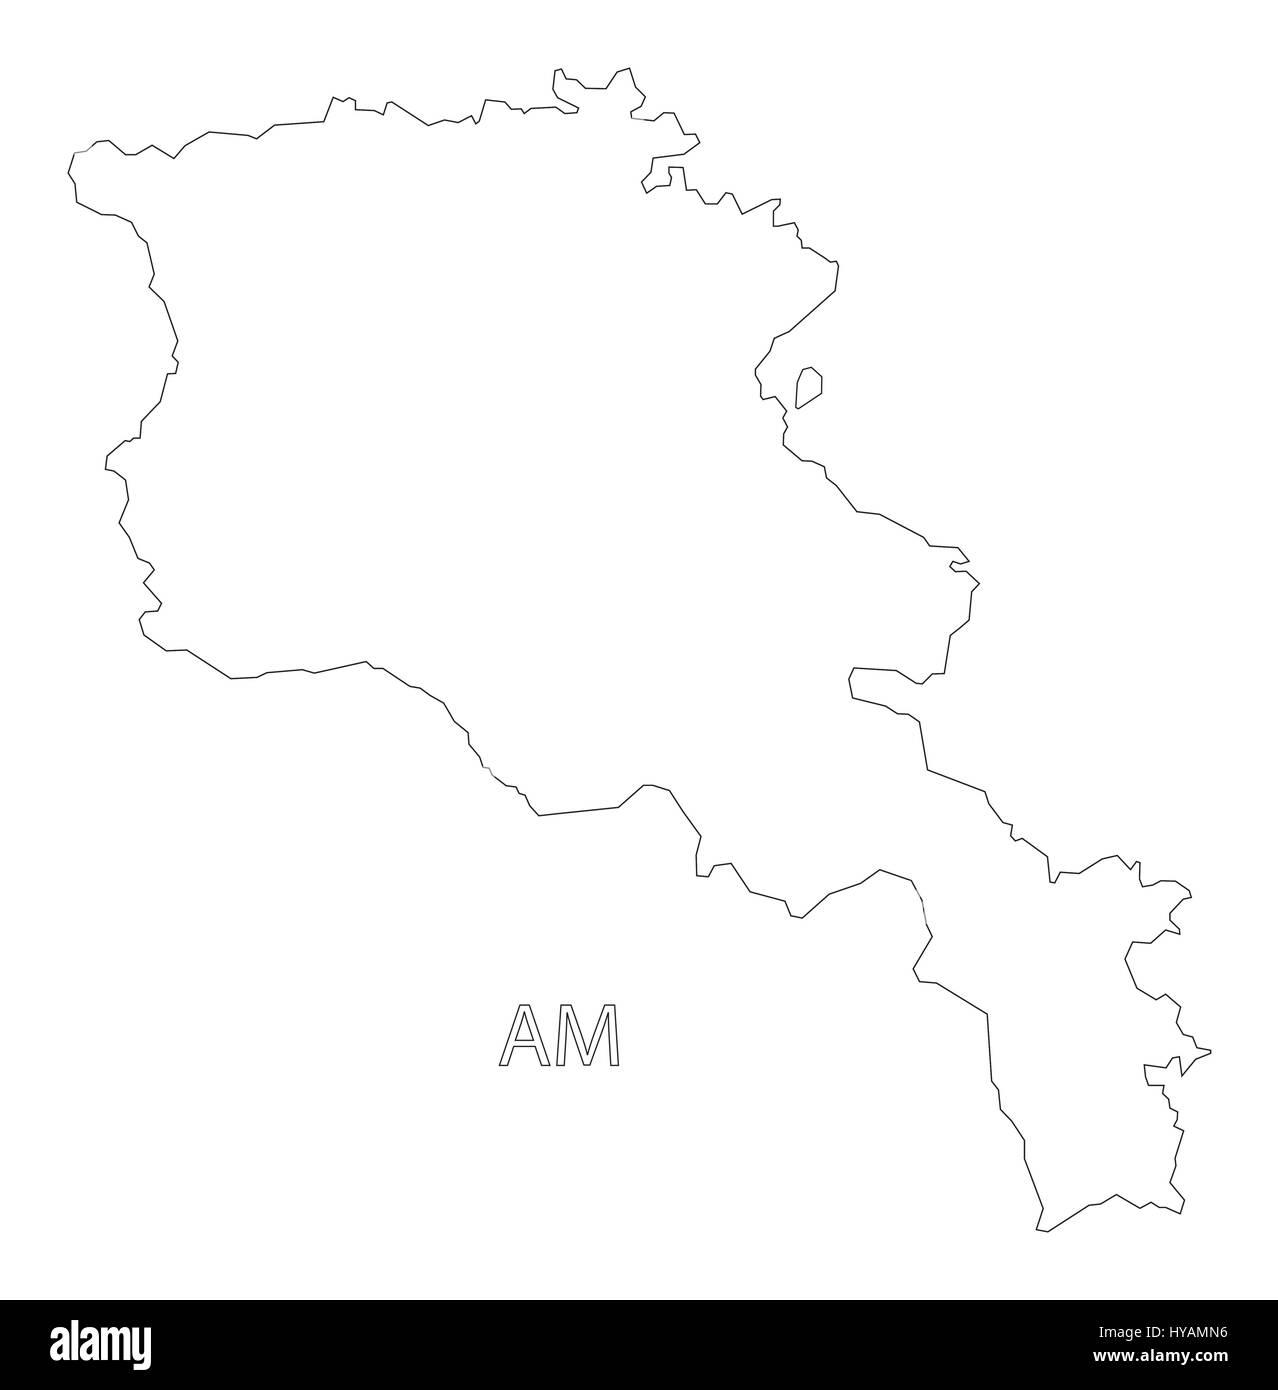 Armenia outline silhouette map illustration - Stock Image